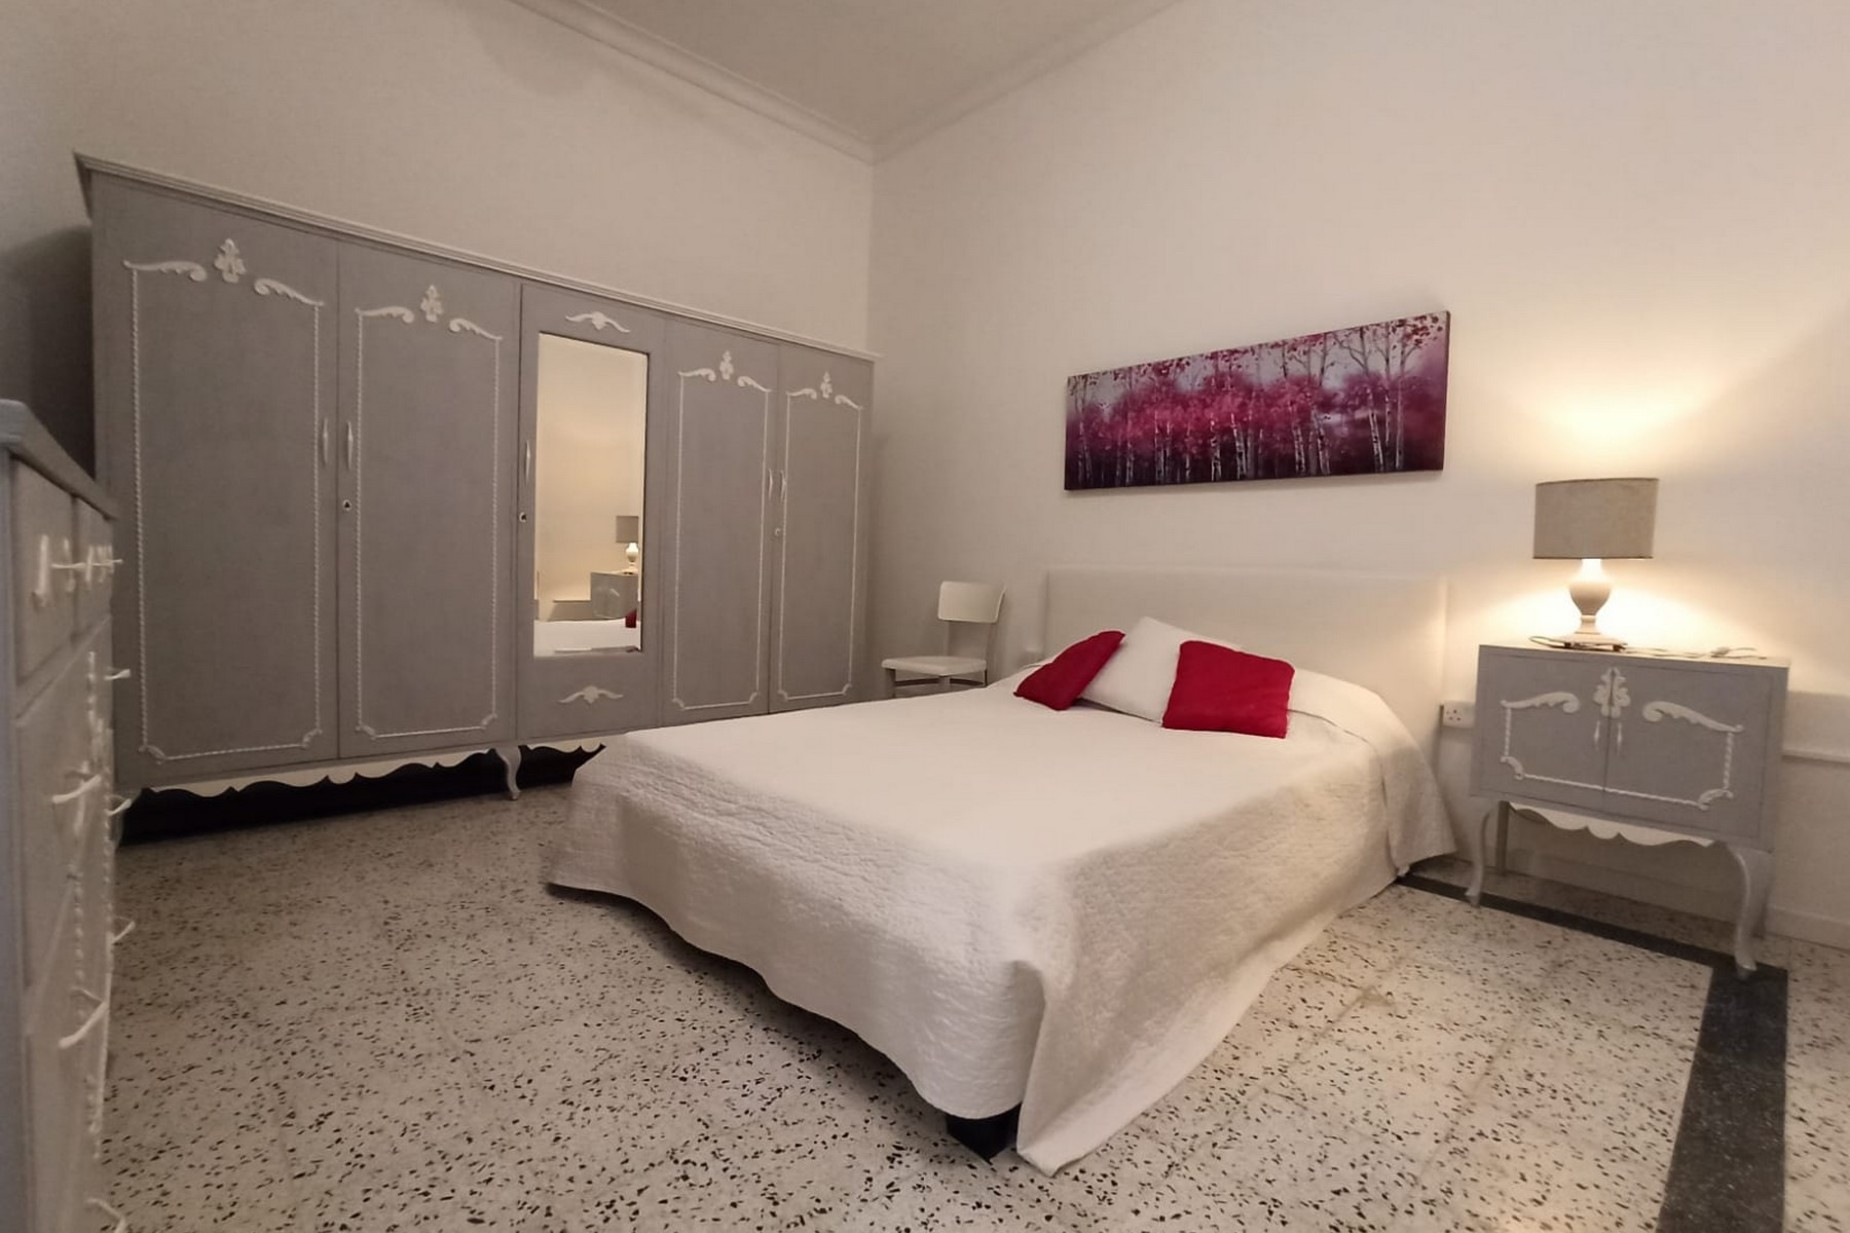 3 bed Town House For Rent in Birkirkara, Birkirkara - thumb 5